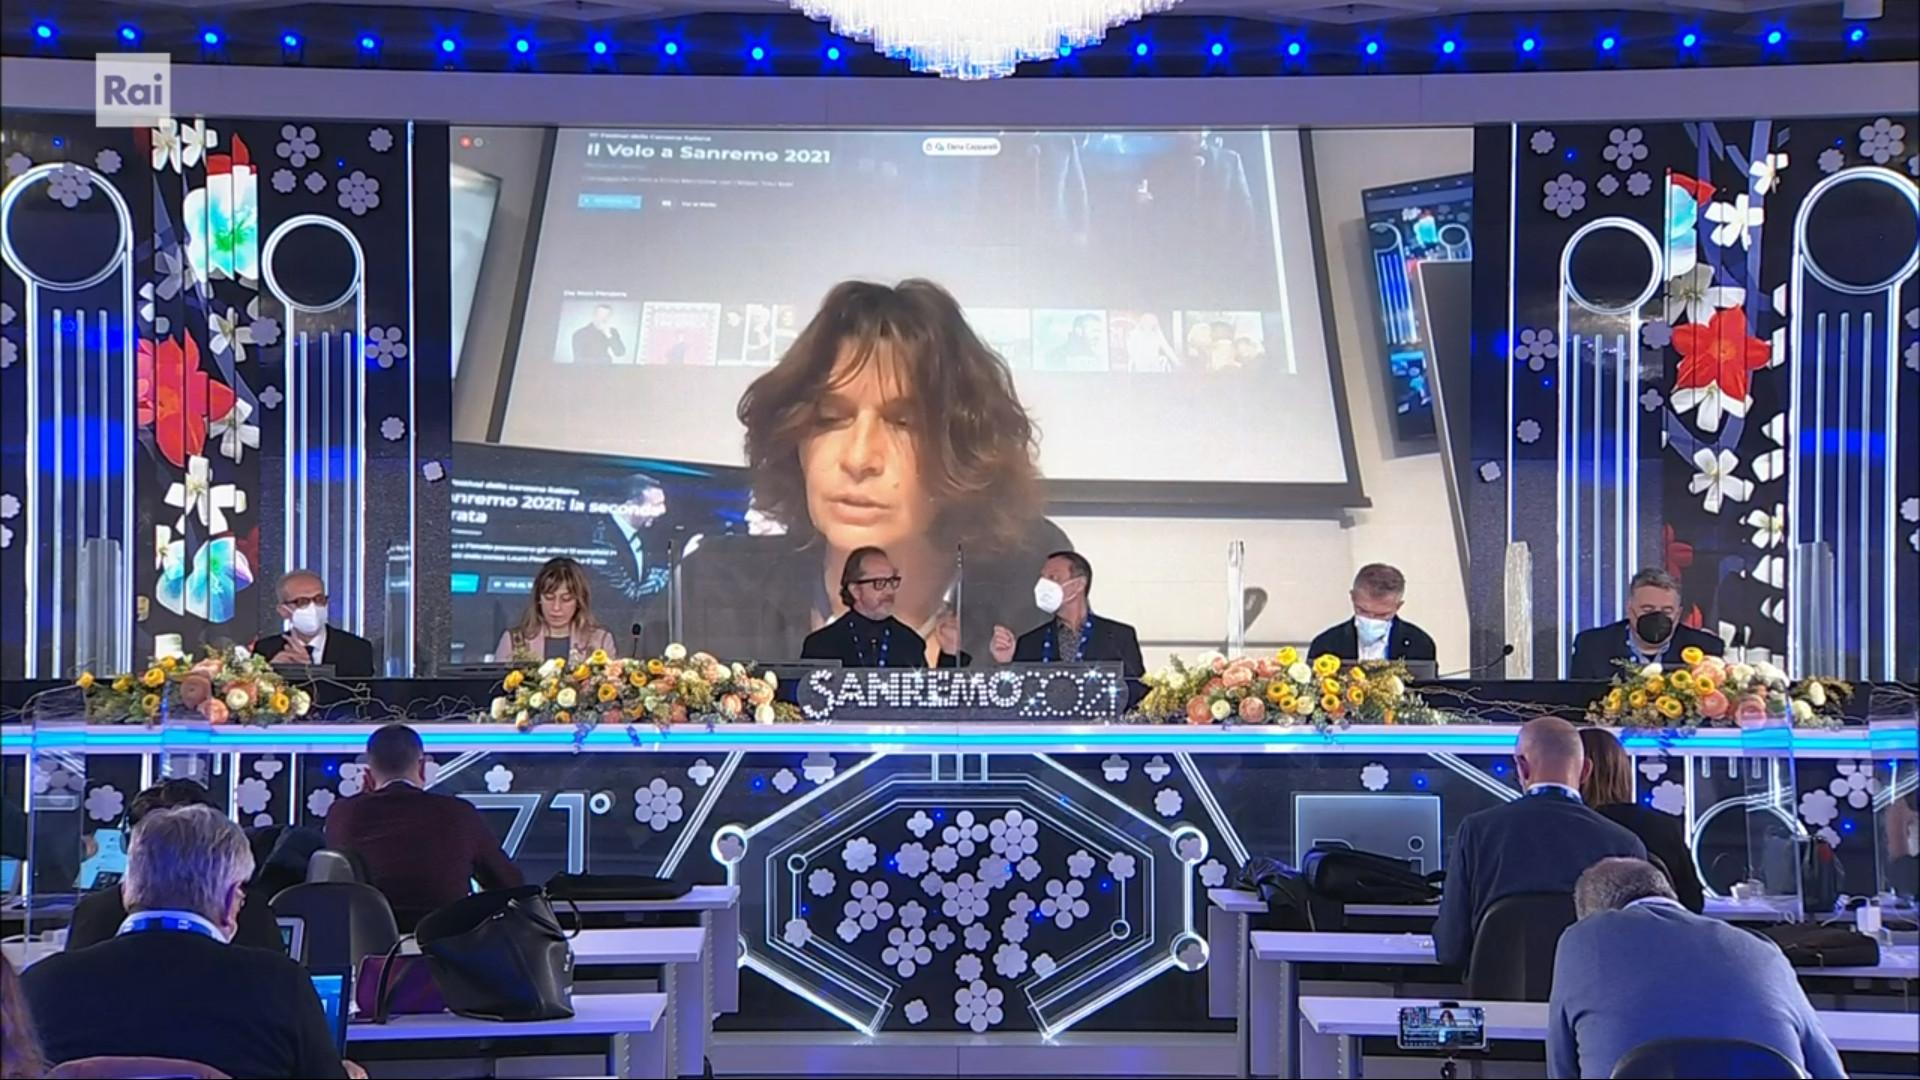 Sanremo 2021 conferenza stampa 4 marzo